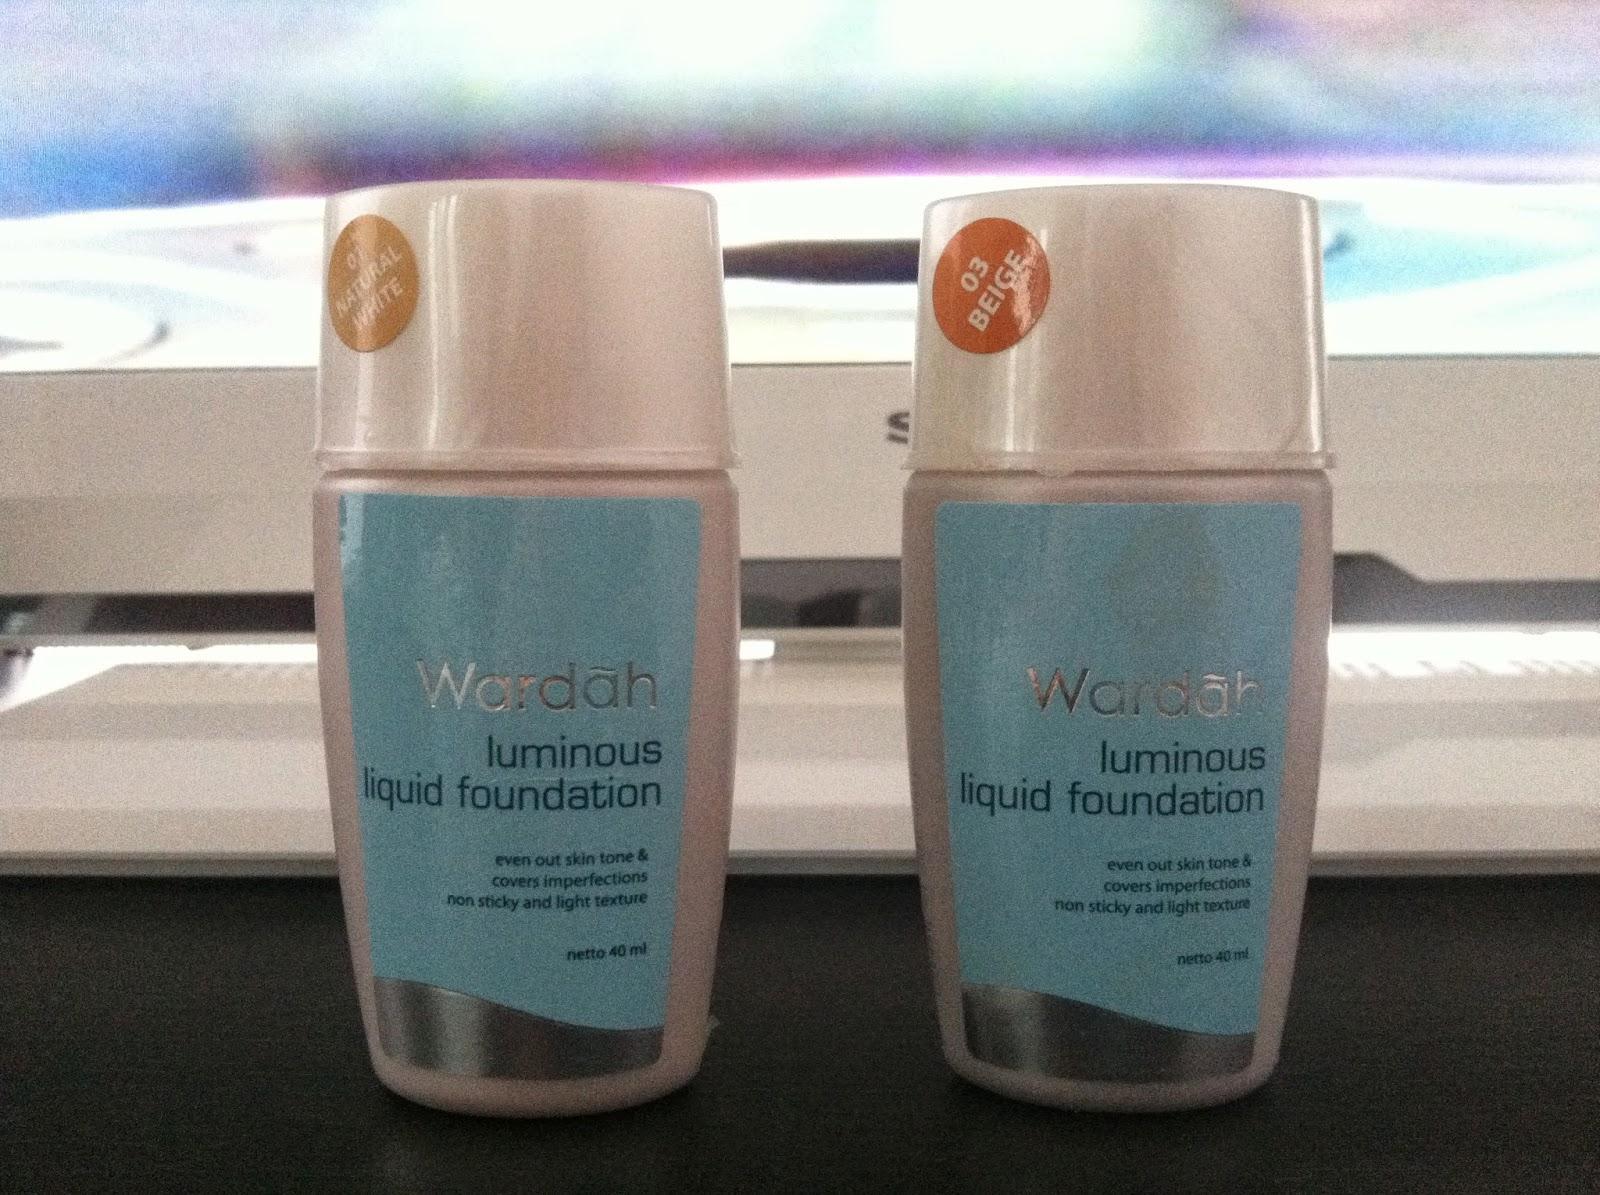 Beauty And Lifestyle Wardah Luminous Liquid Foundation Review Warda Two Way Cake